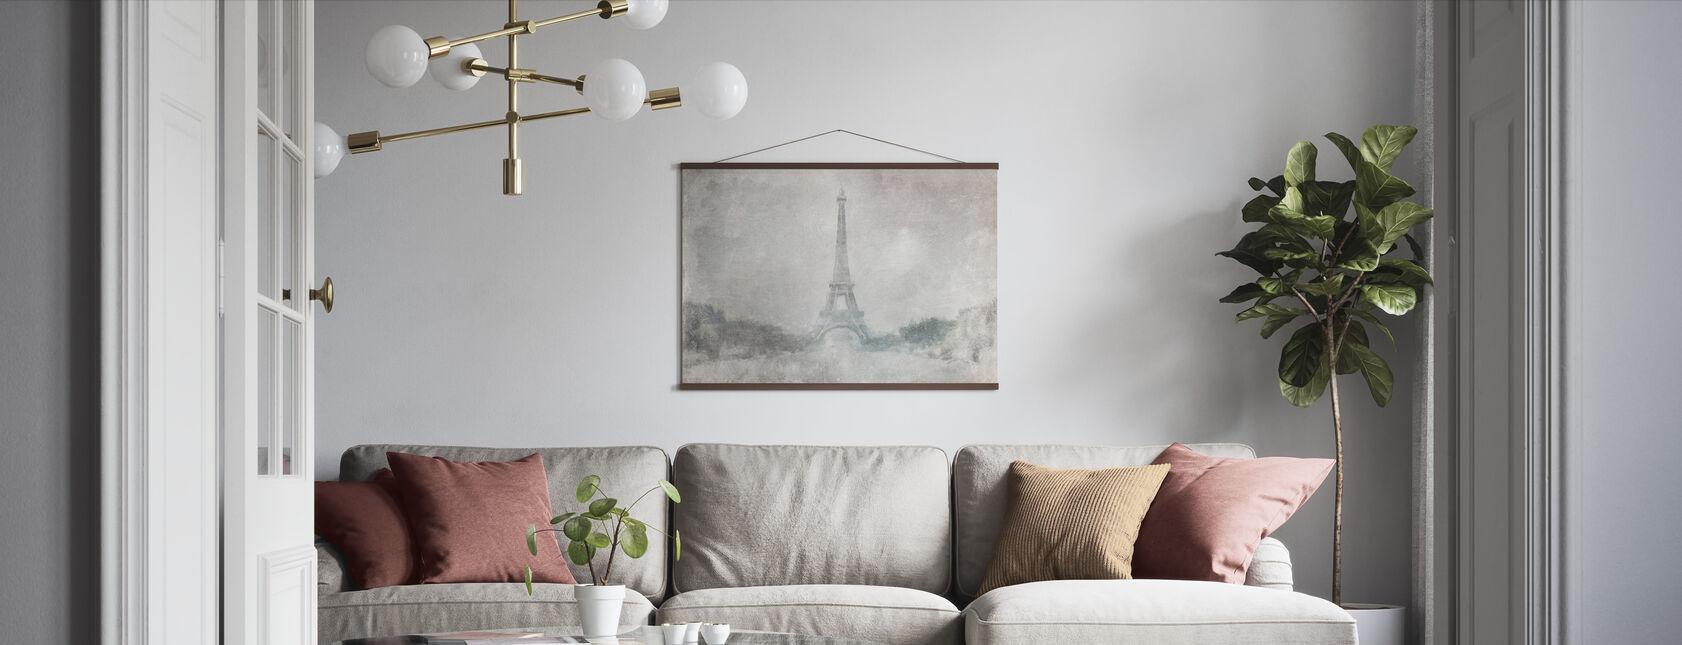 Eiffel-torni - Juliste - Olohuone